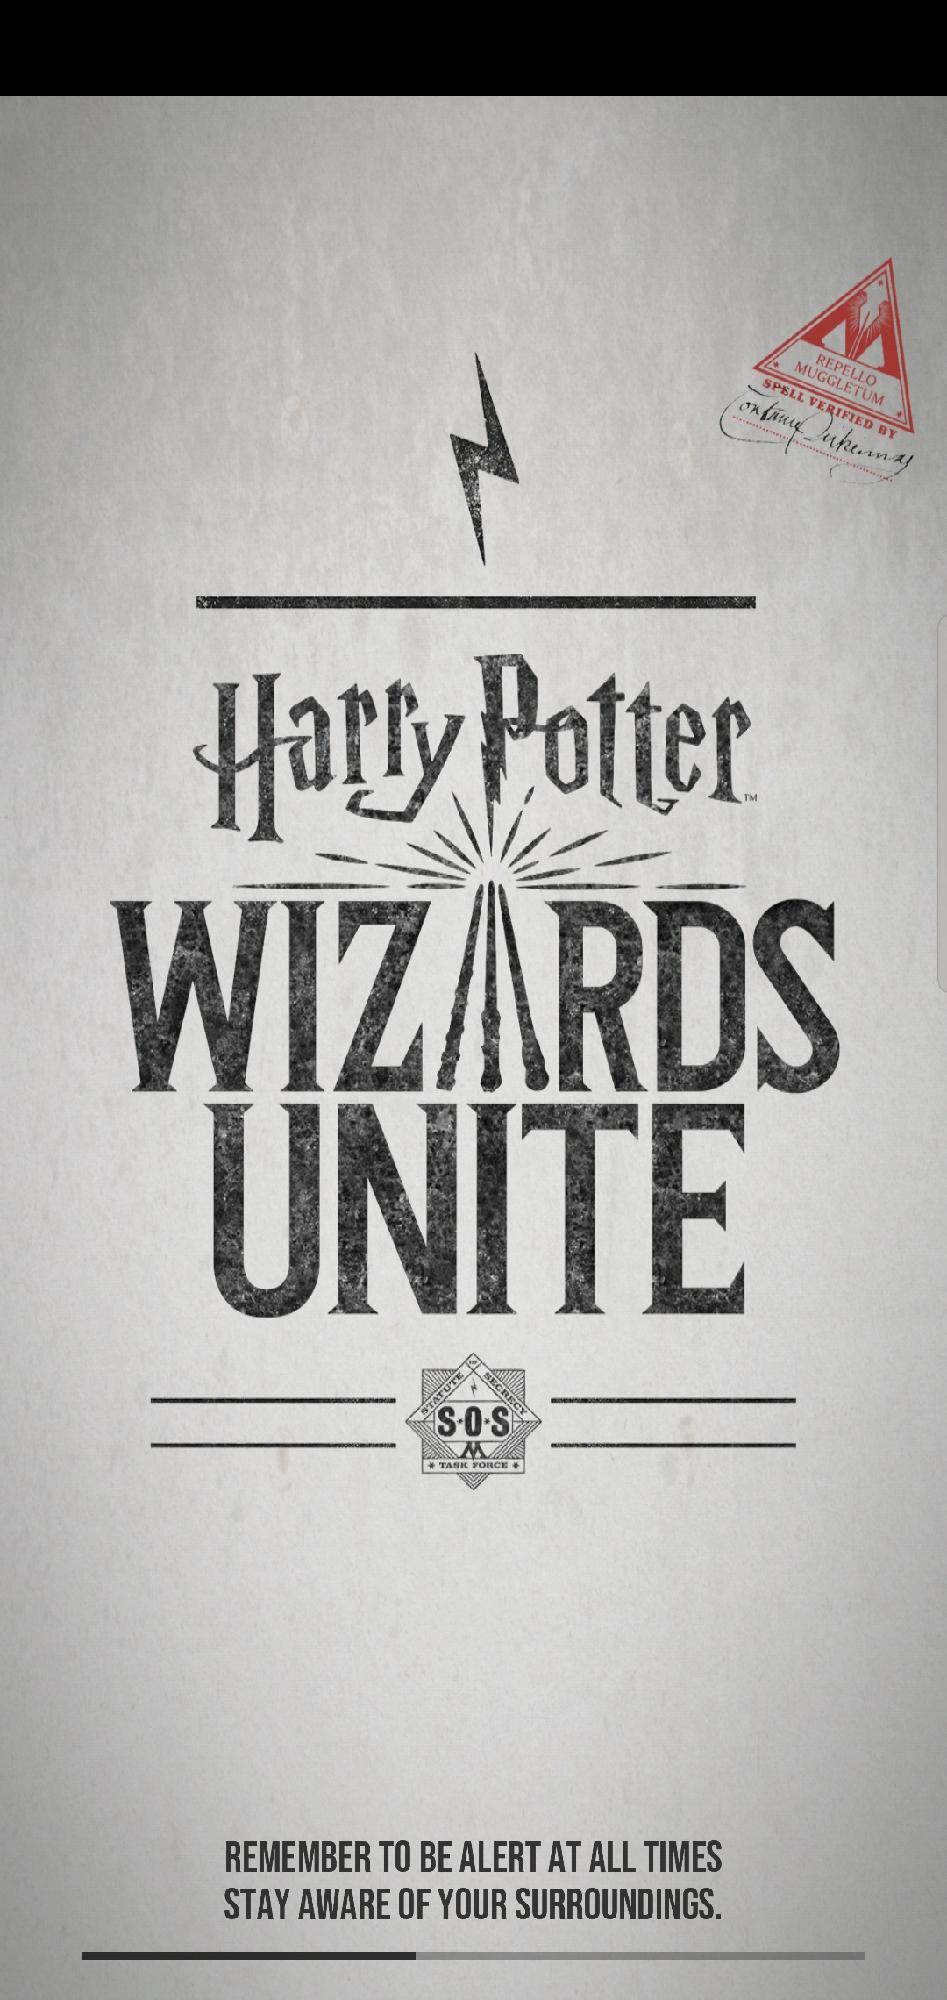 Wizards unite